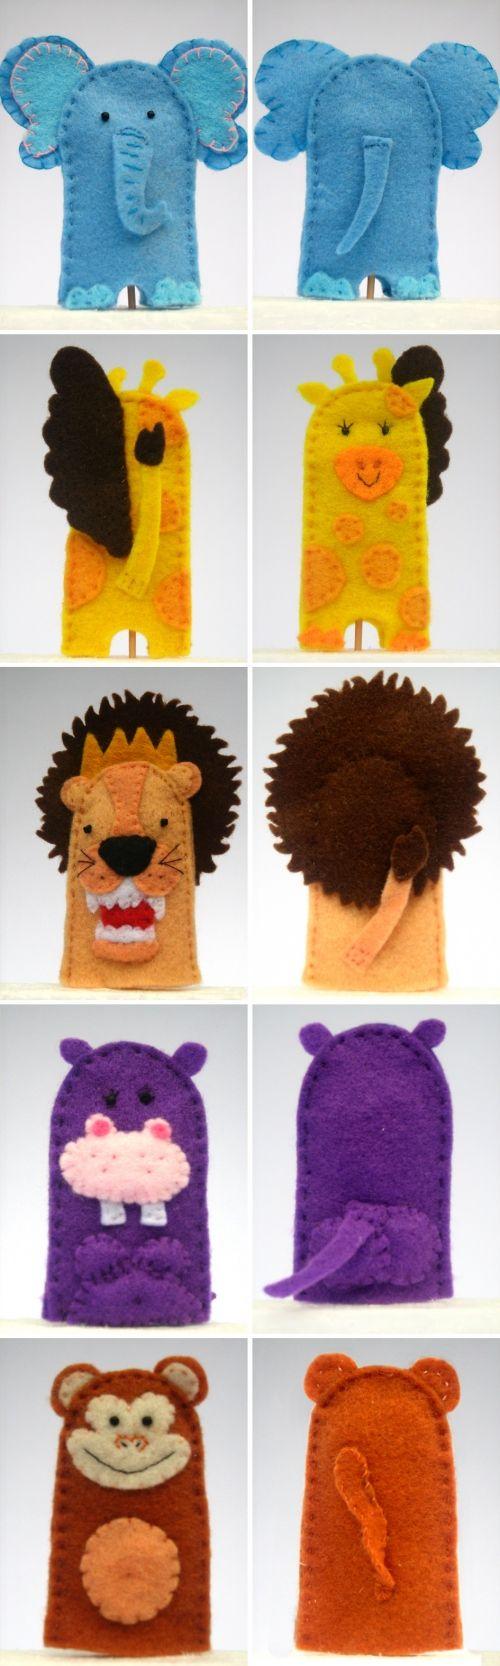 Marionetas de animales de la selva en detalle, dedoches de animais em feltro, felt animals fingertoys